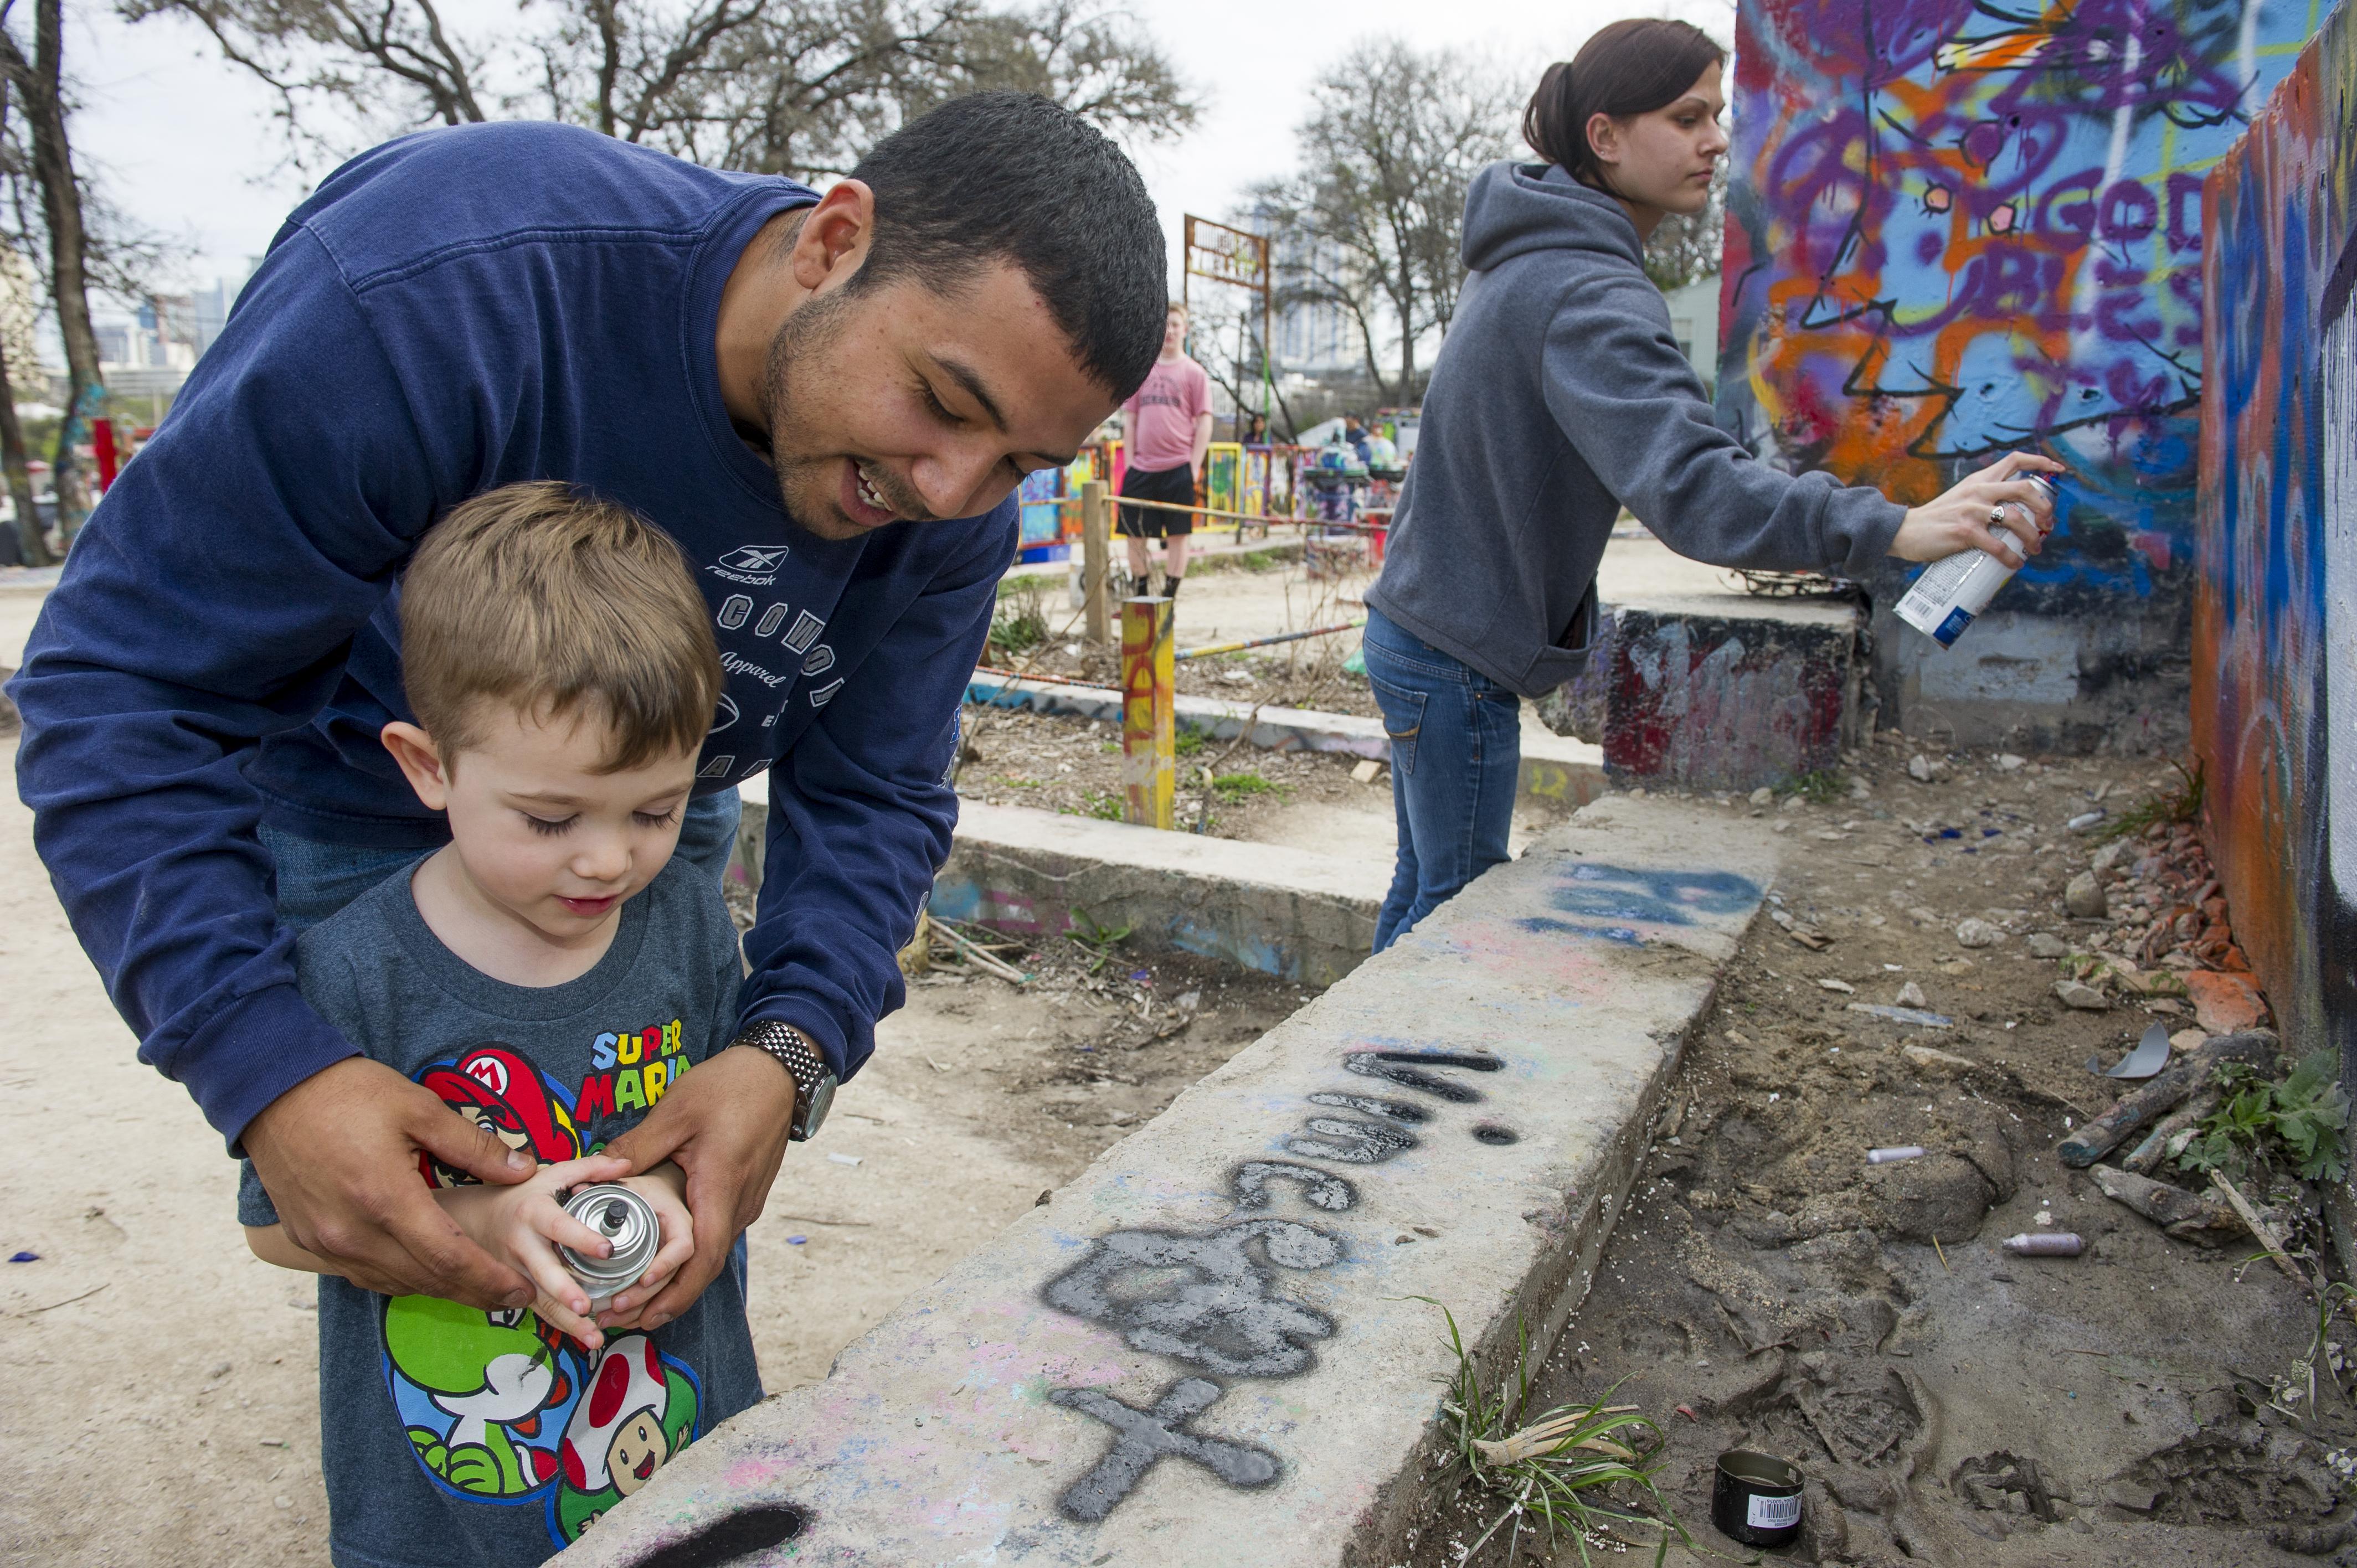 Man helping kid spray paint on graffiti park wall